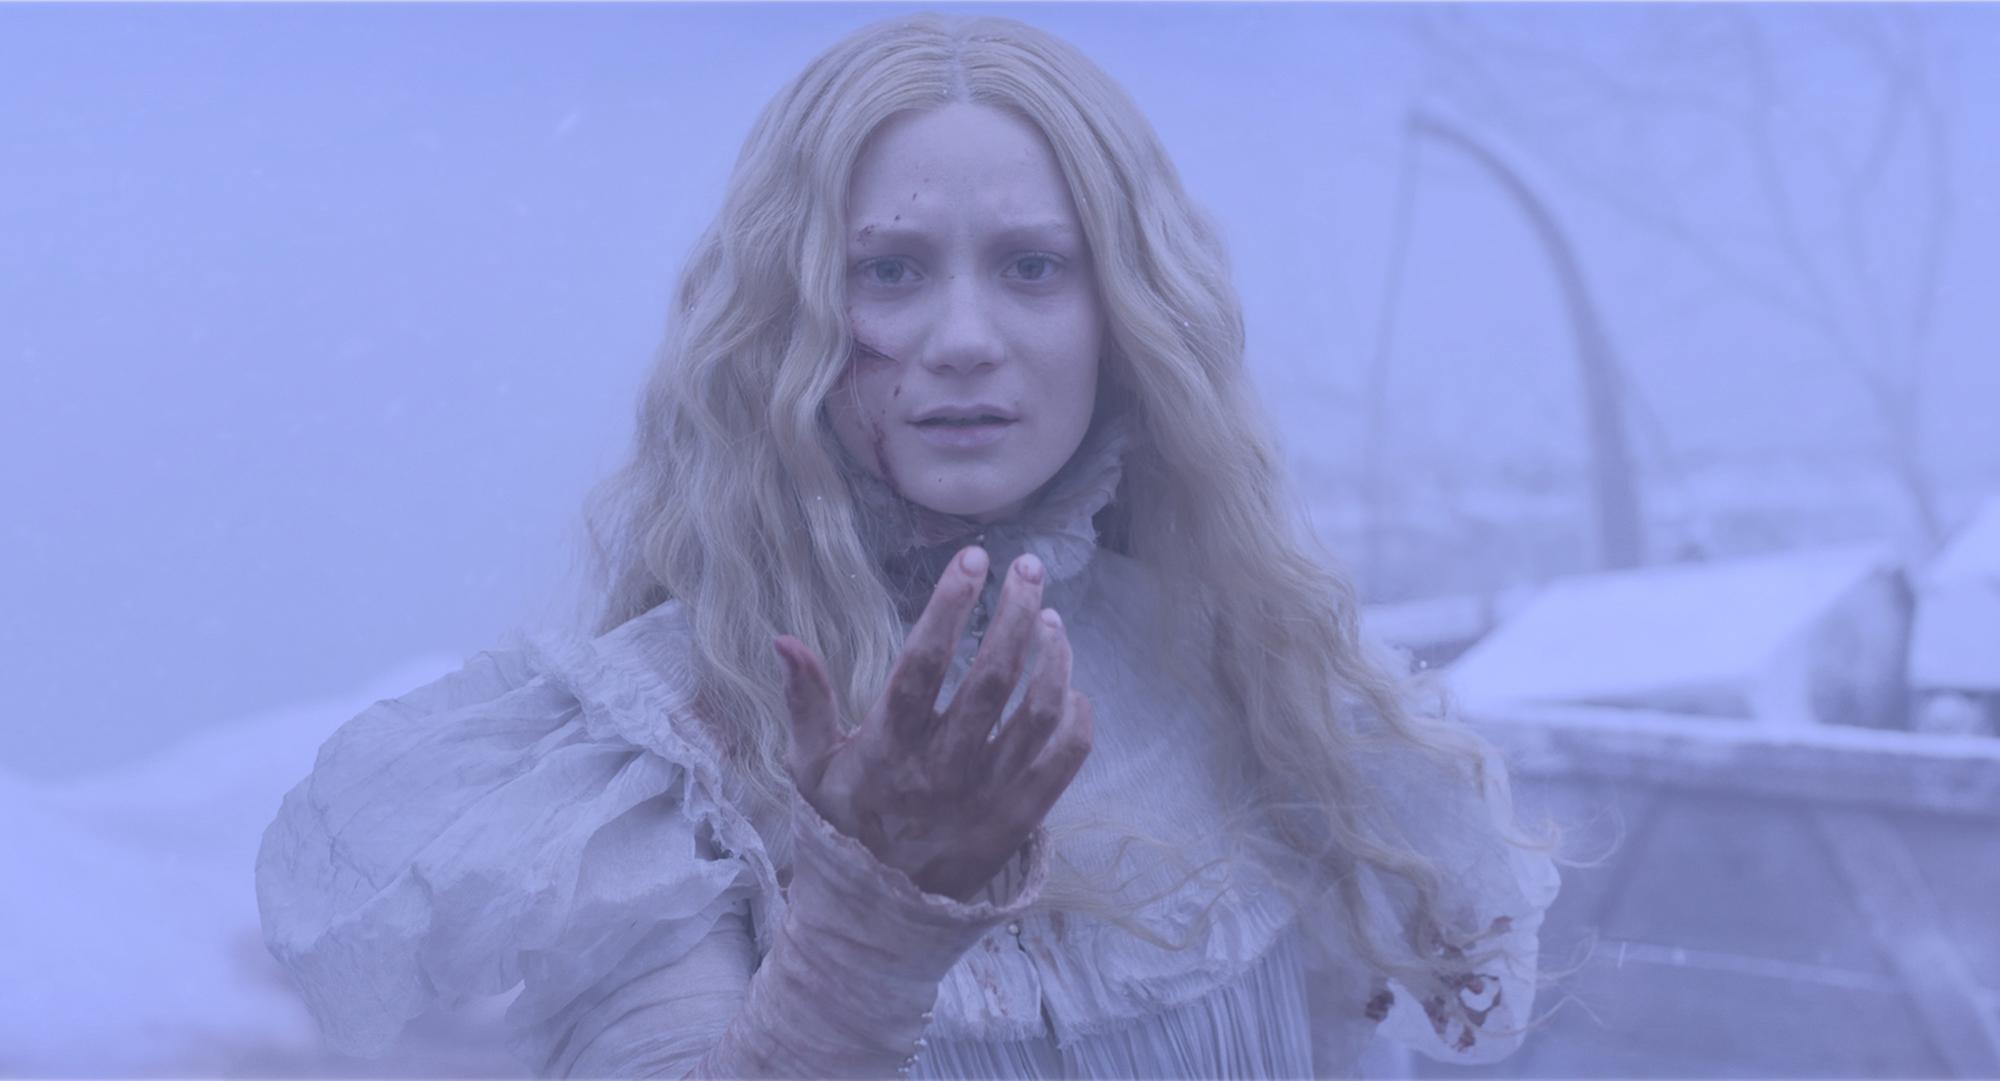 Mia Wasikowska is tortured by ghosts in 'Crimson Peak'